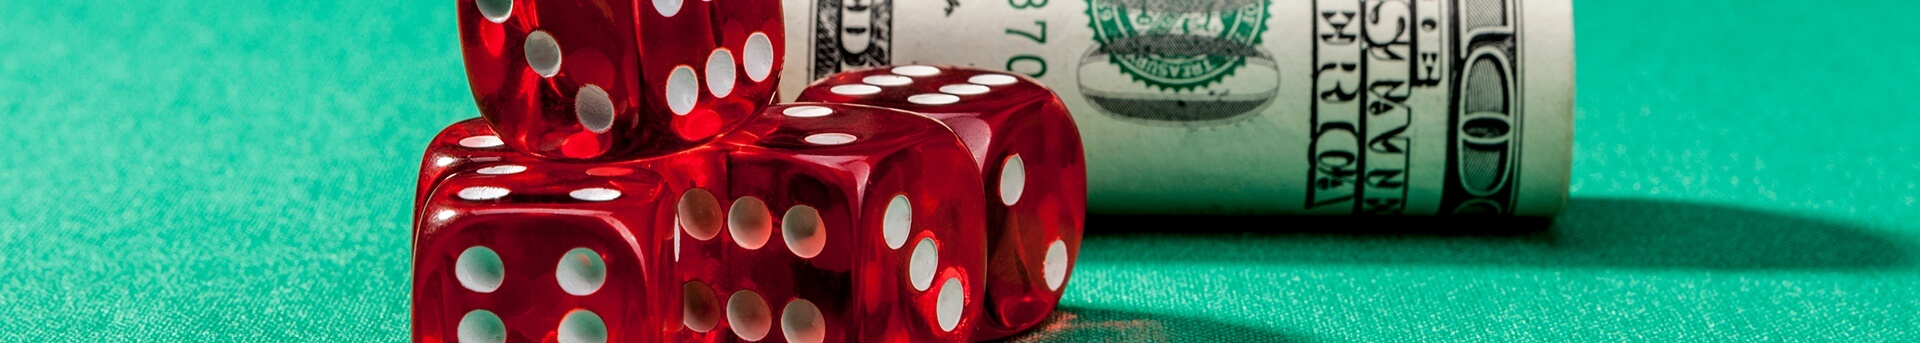 Dices Casino Tips